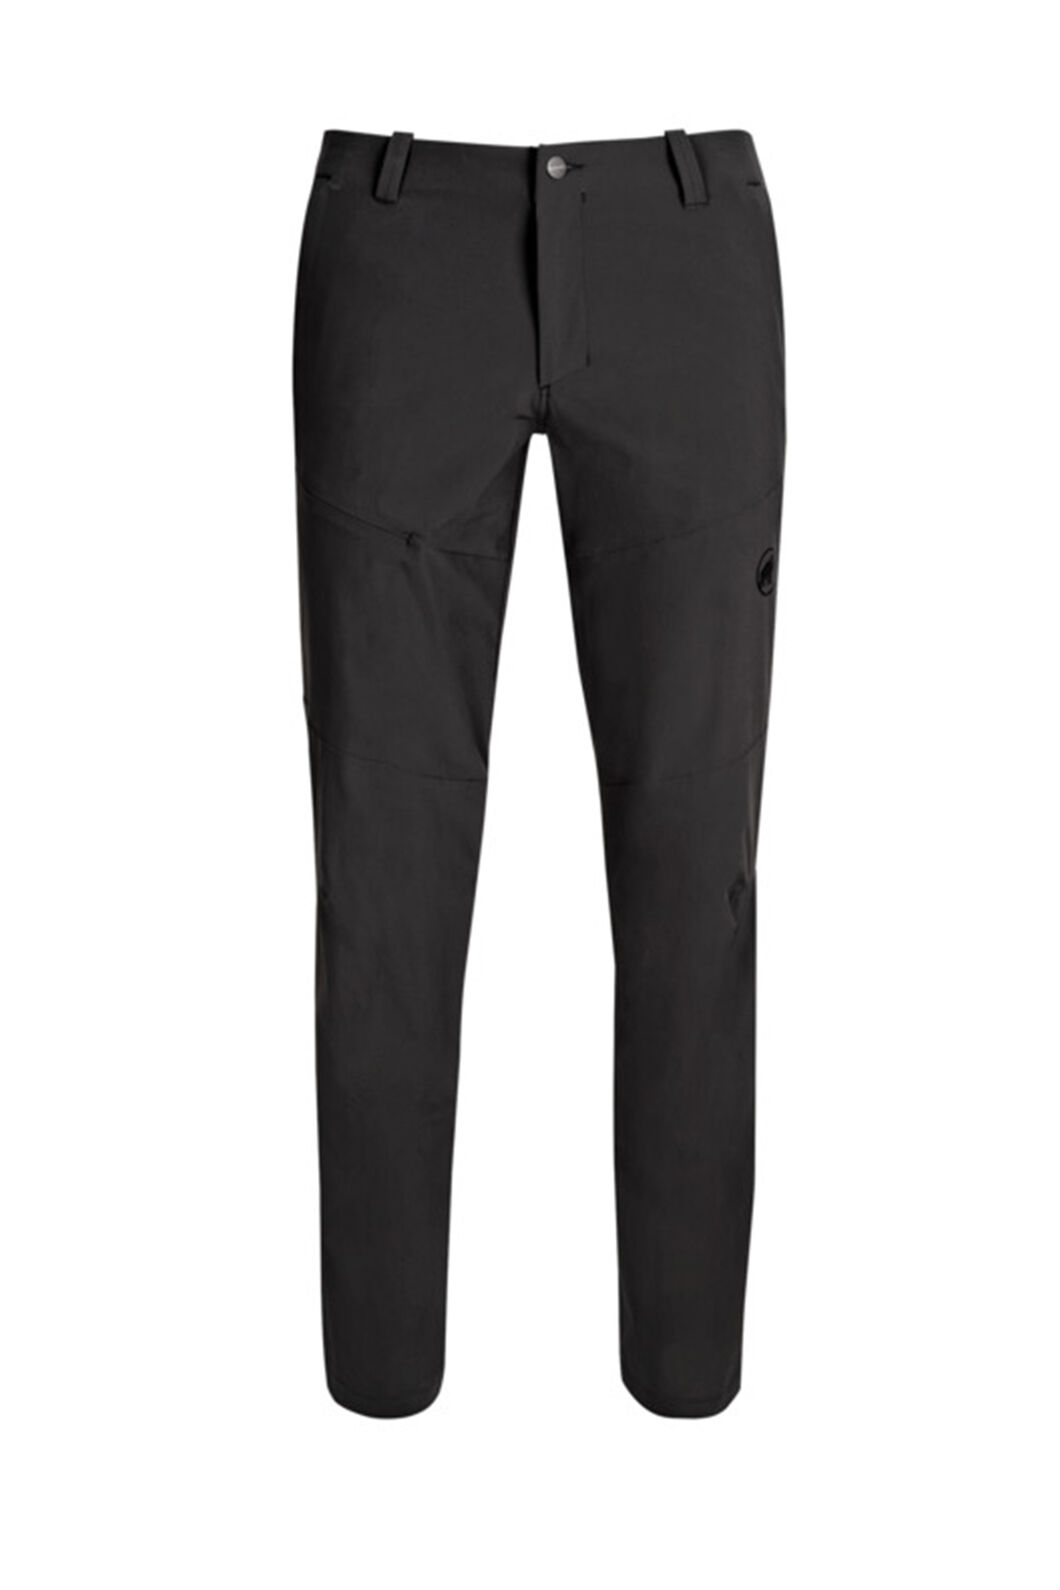 Mammut Runbold Pants — Men's, Phantom, hi-res